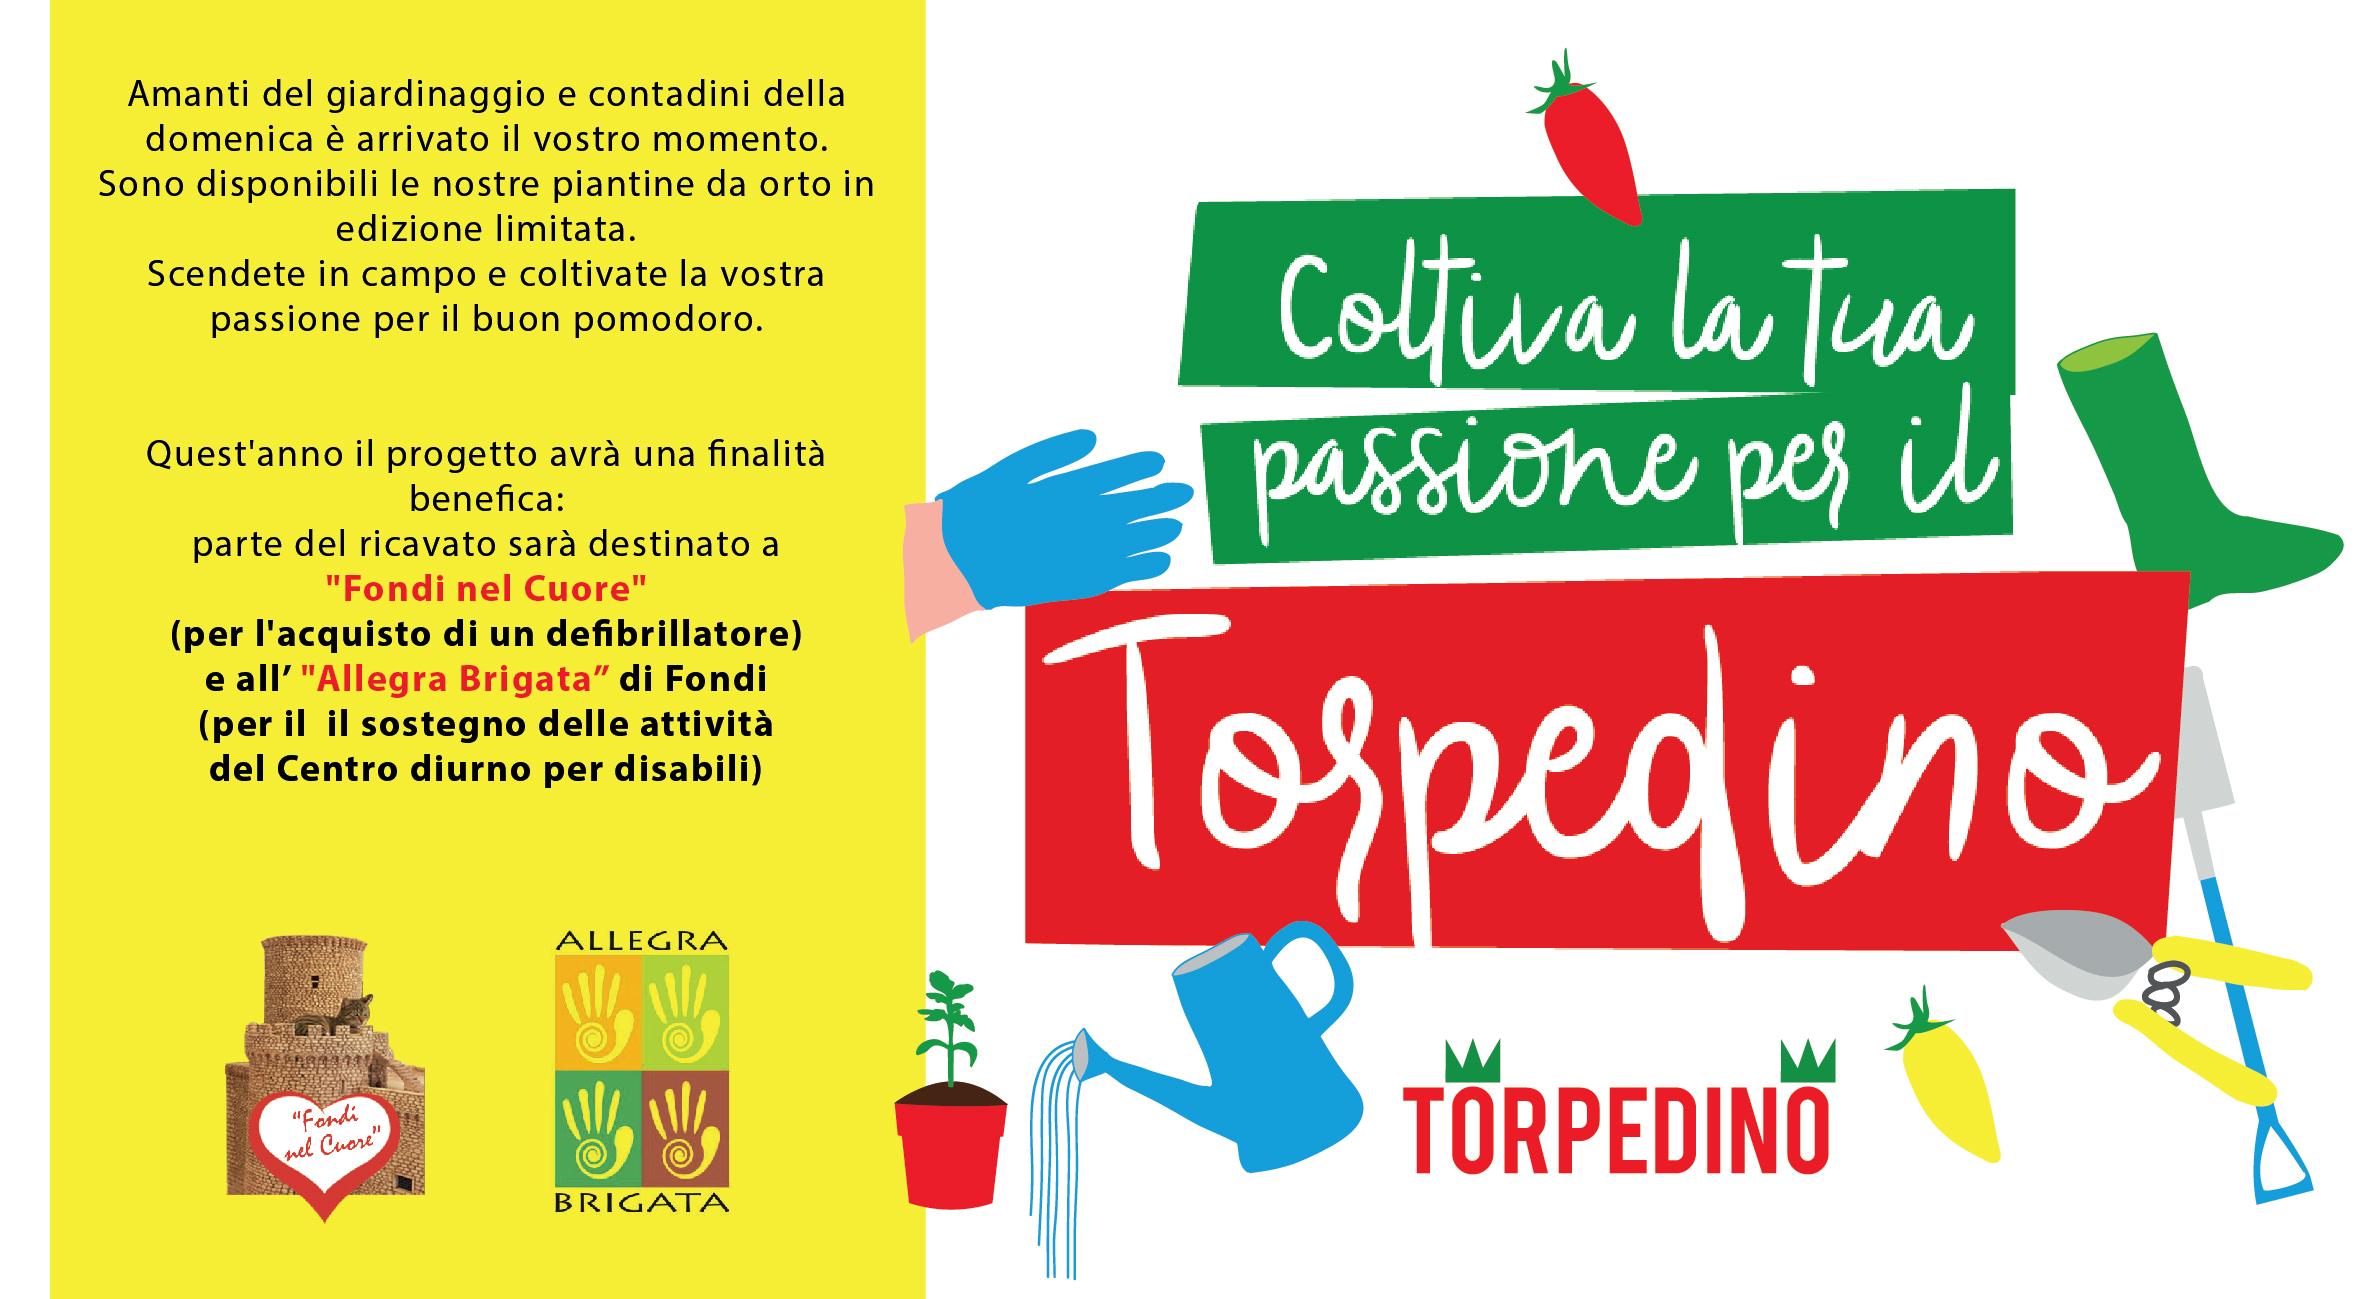 campagna_adotta_torpedino-2